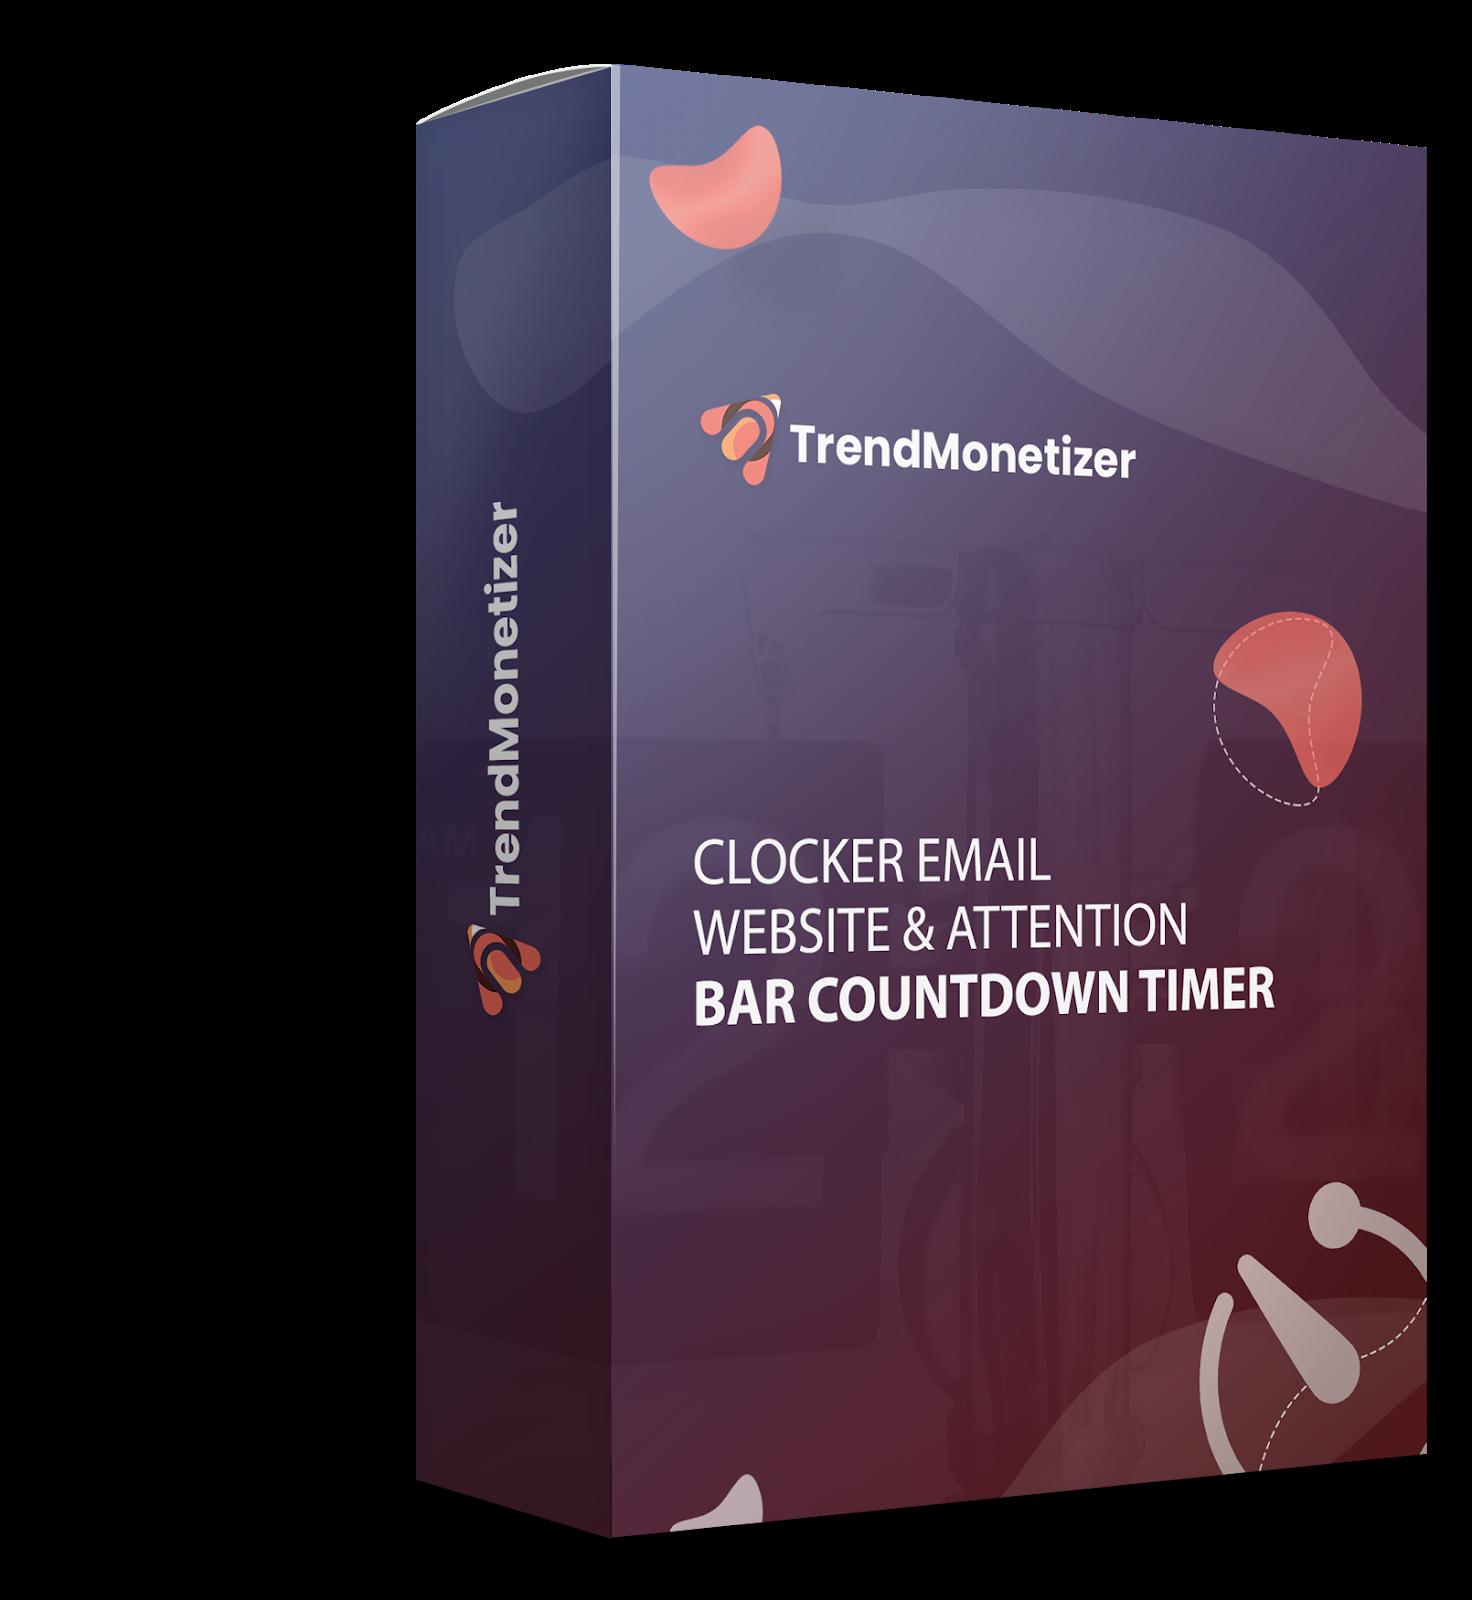 Clocker email, website & attention bar countdown timer